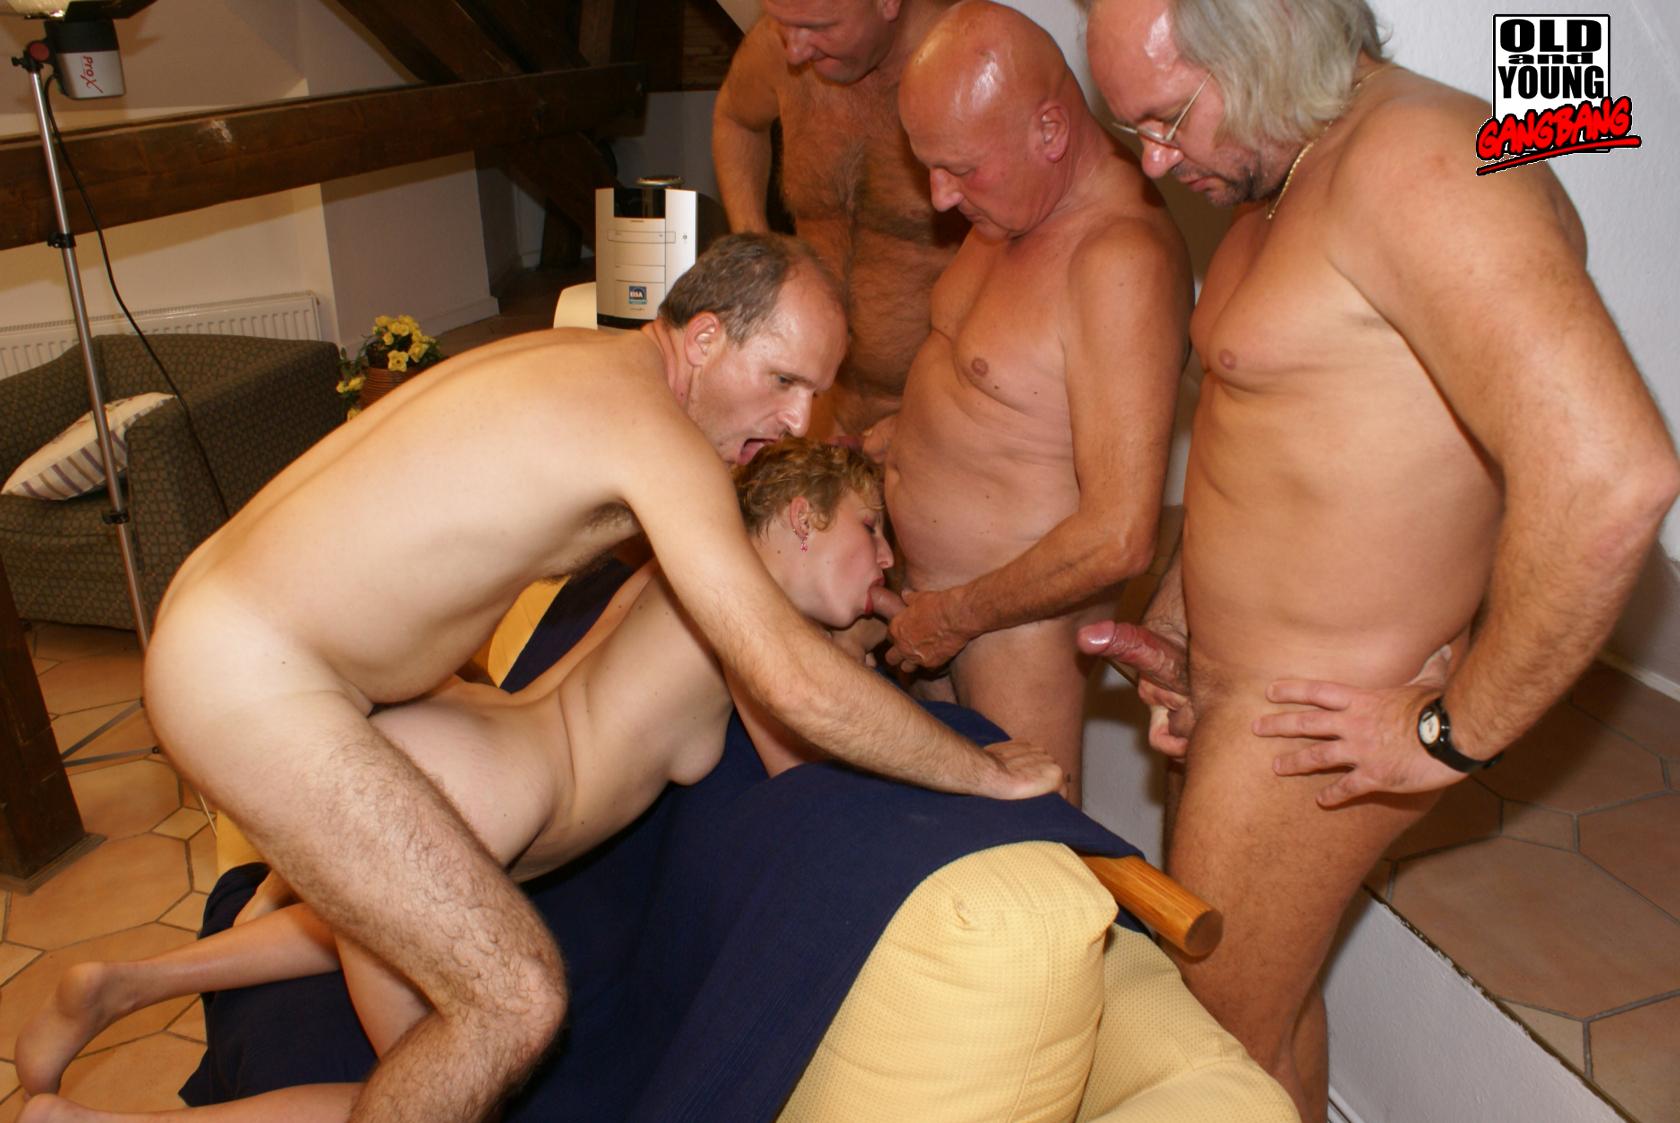 Old Men Gangbang Mature Porno old man gangbang tube sex photo   free hot nude porn pic gallery